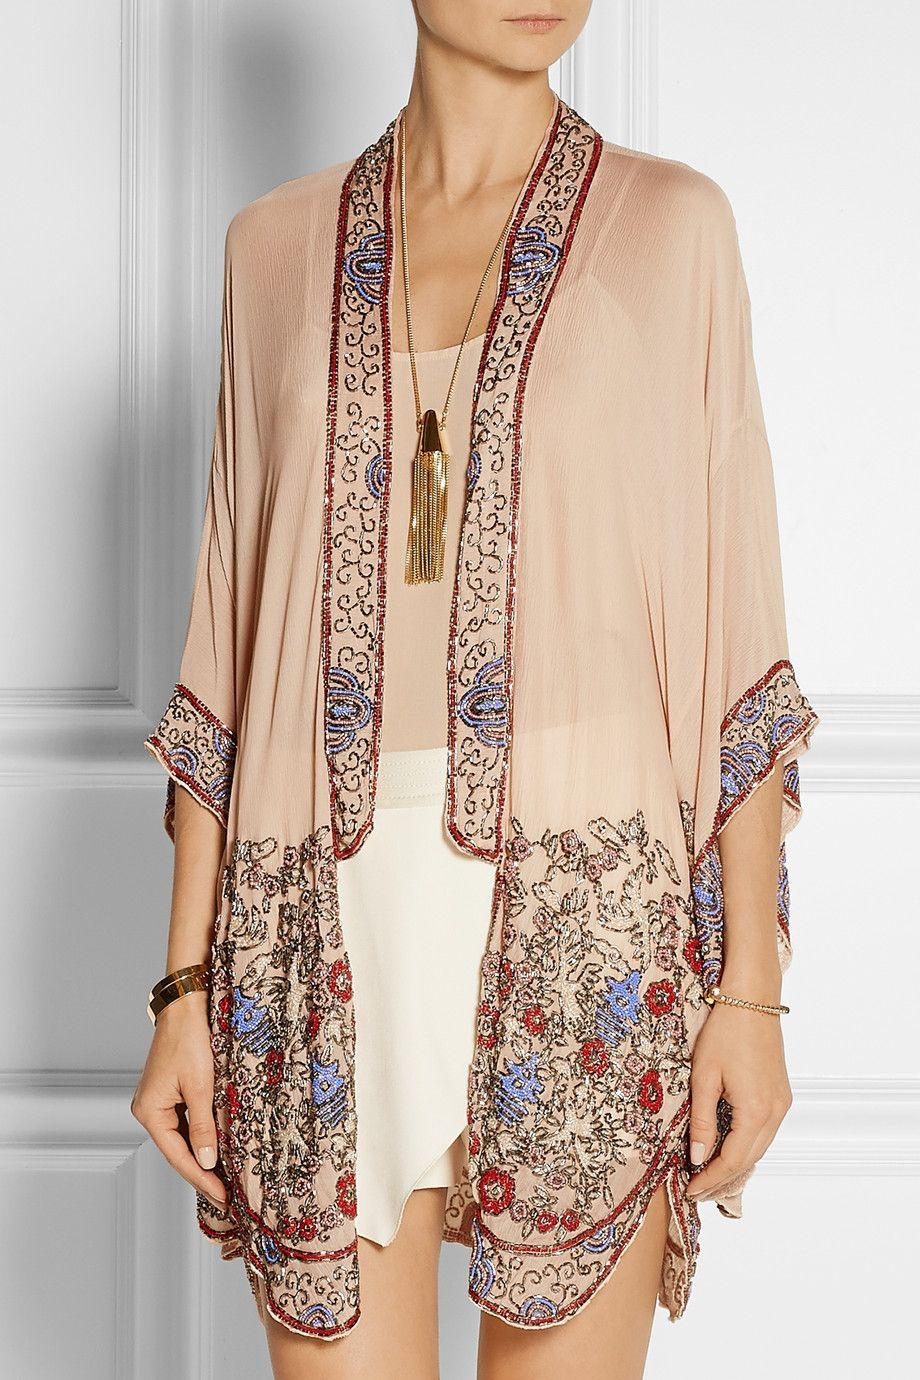 48ad58caa8a Anna Sui - Bead-embellished crinkled silk-chiffon kimono jacket ...